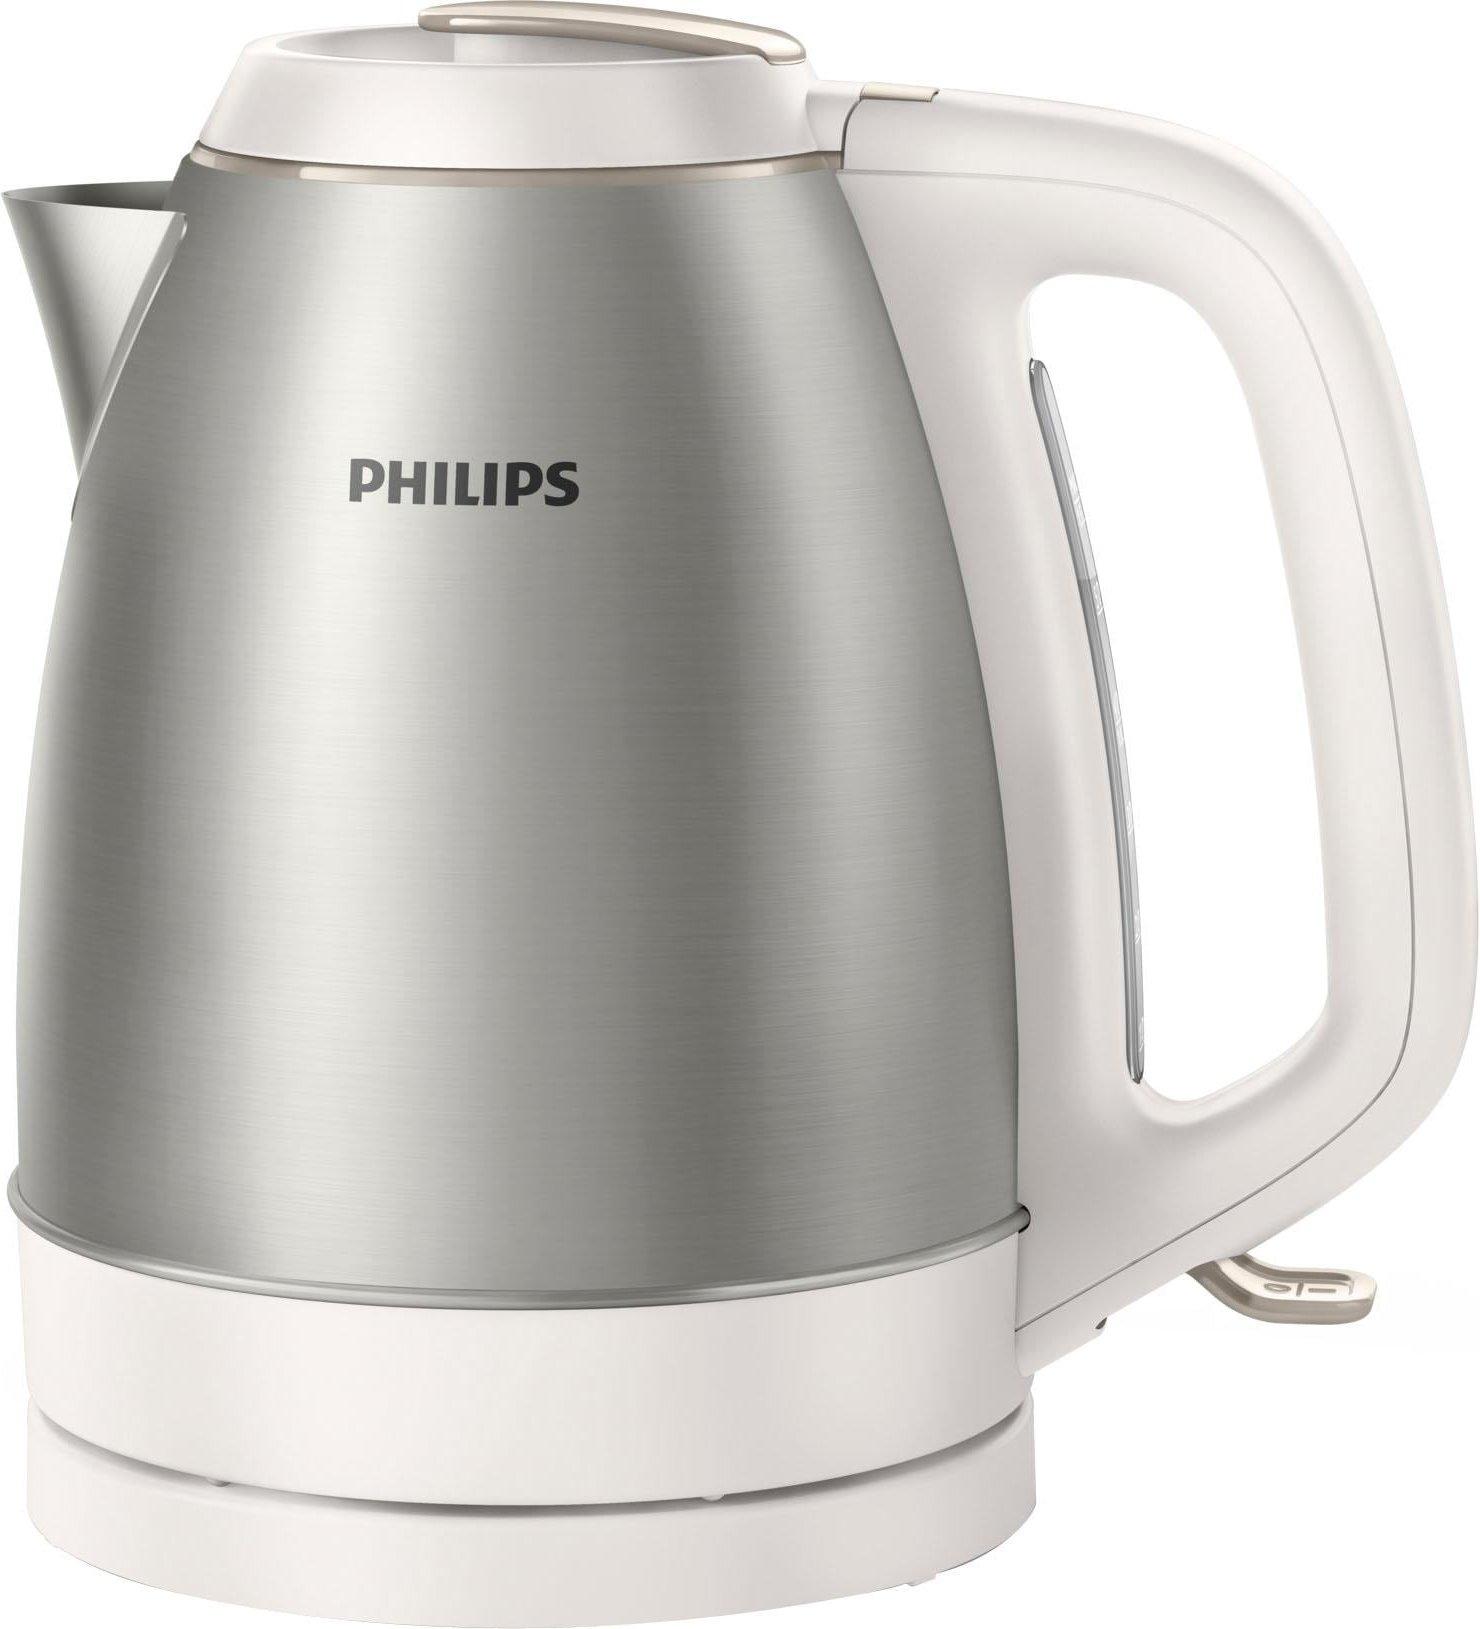 Philips Wasserkocher HD9305/00 15 Liter 2200 Watt